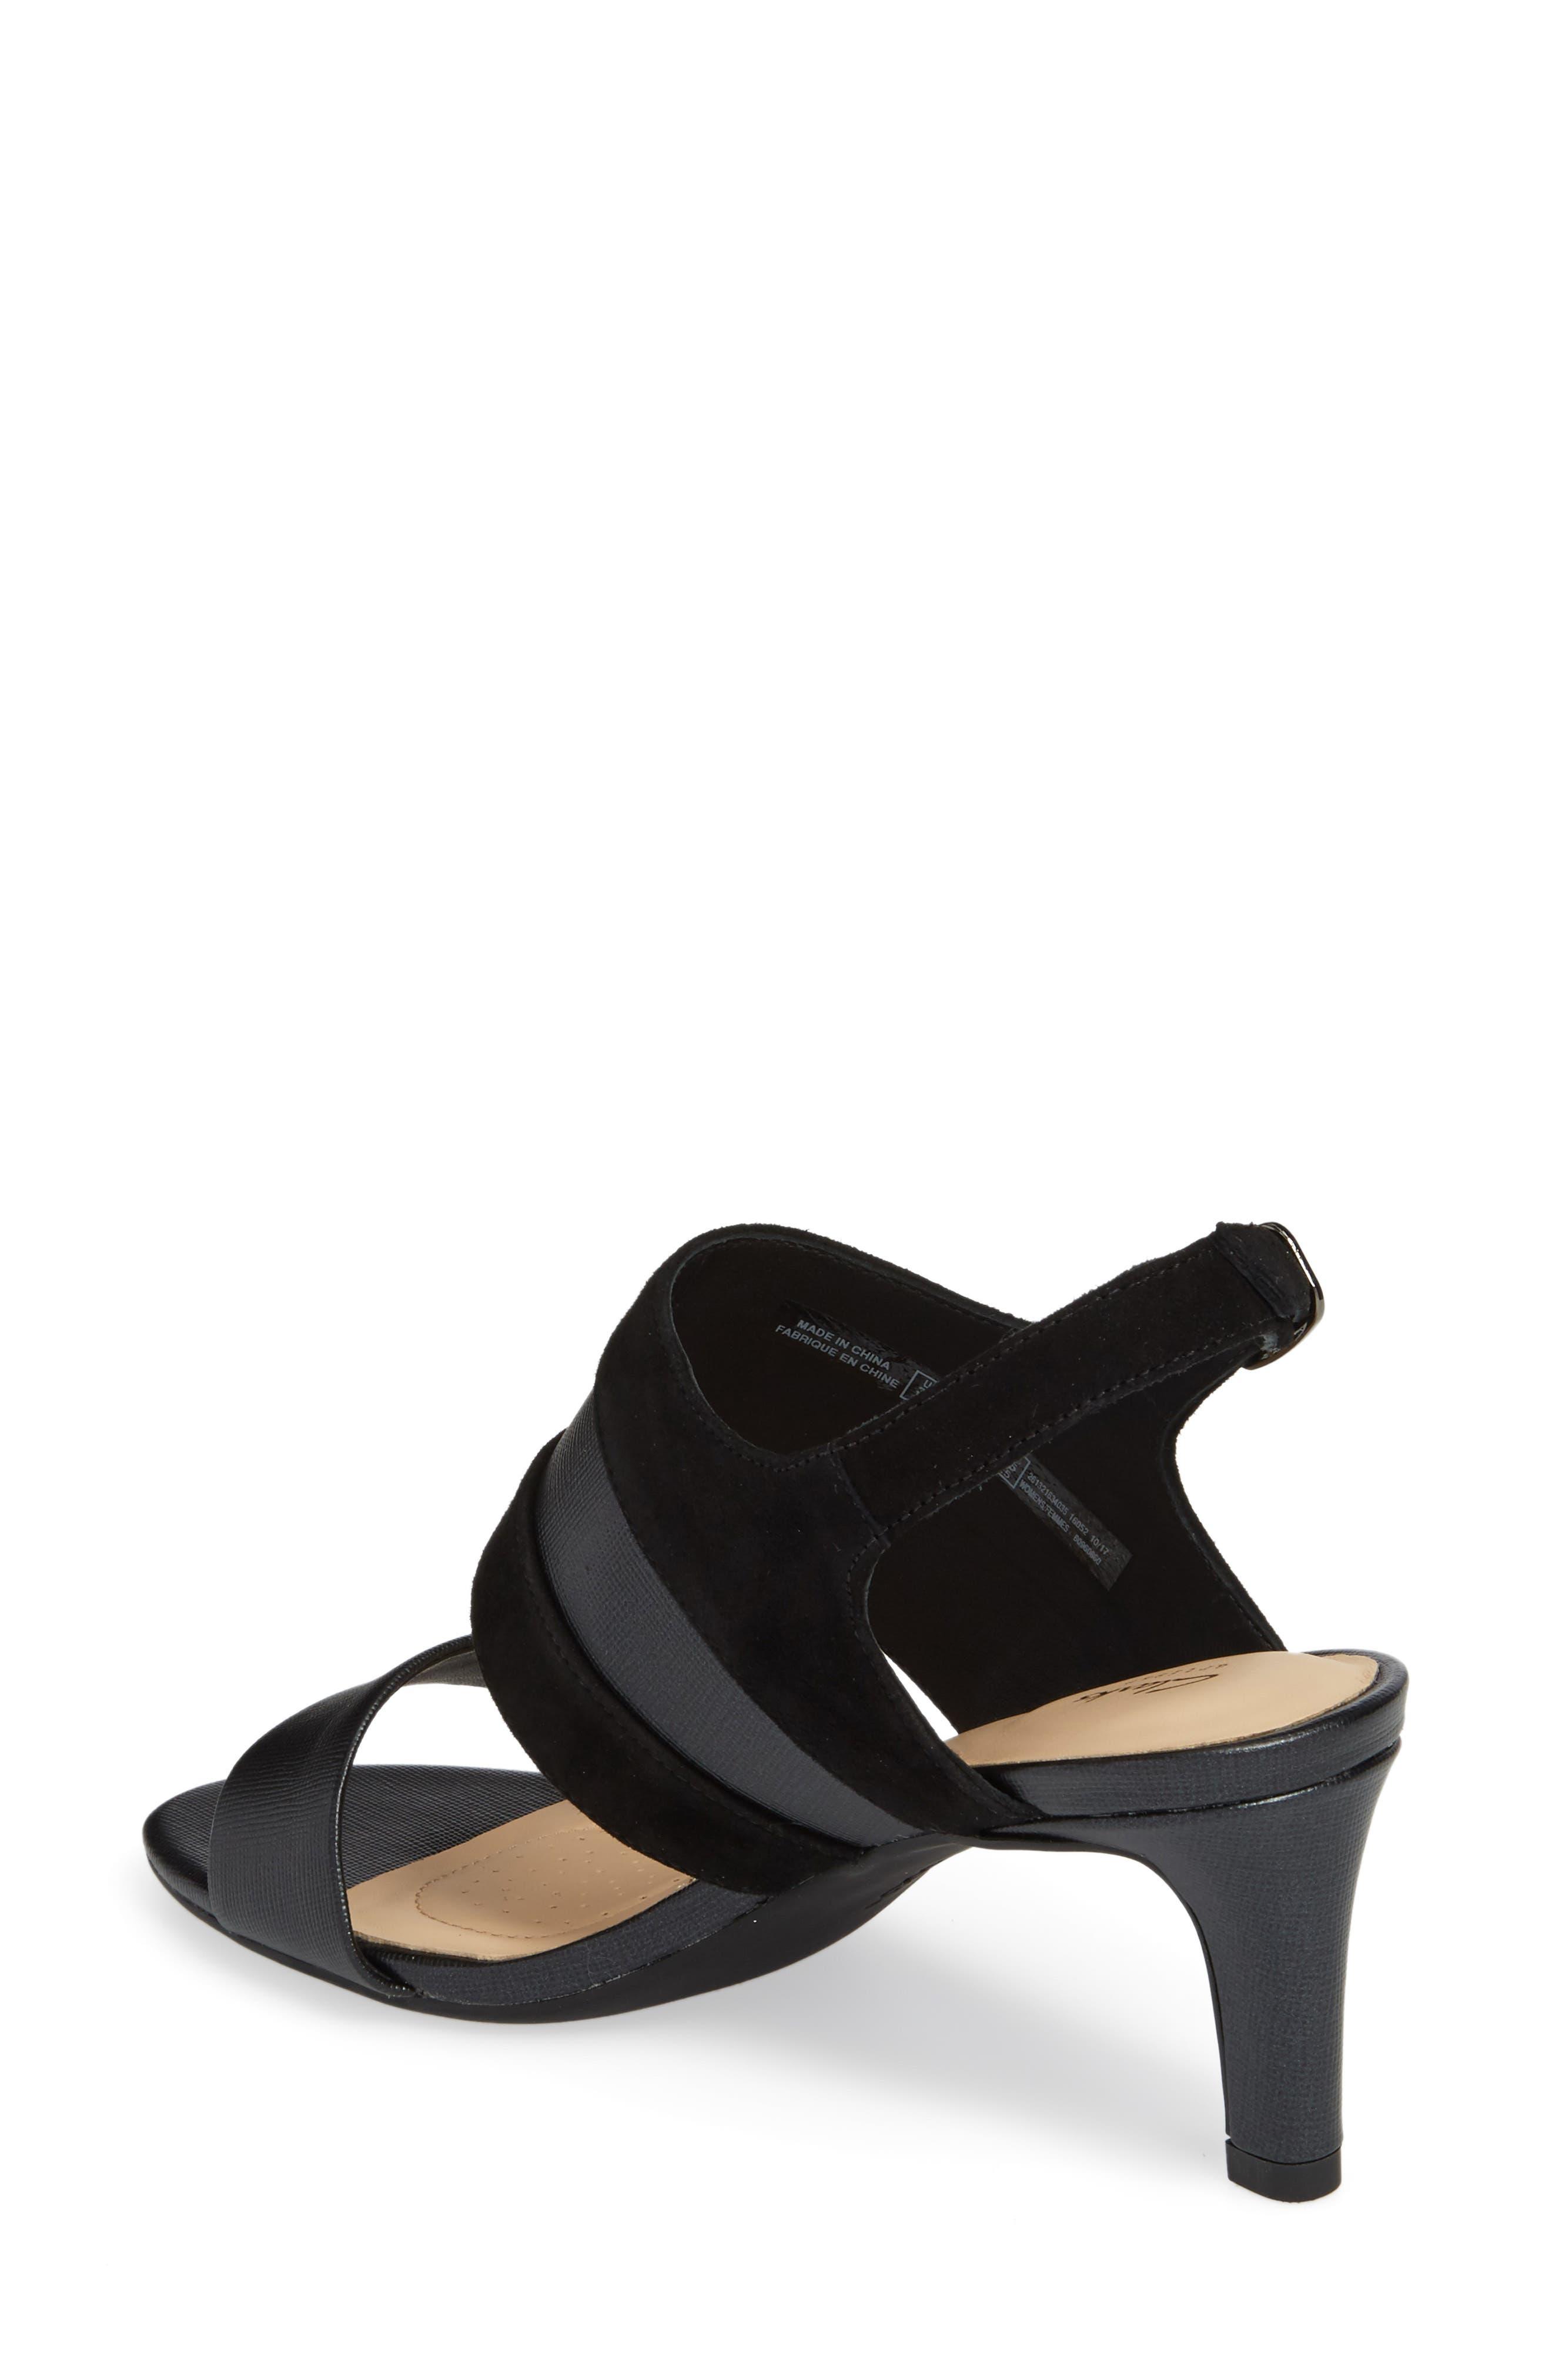 Laureti Joy Slingback Sandal,                             Alternate thumbnail 2, color,                             BLACK COMBI SUEDE